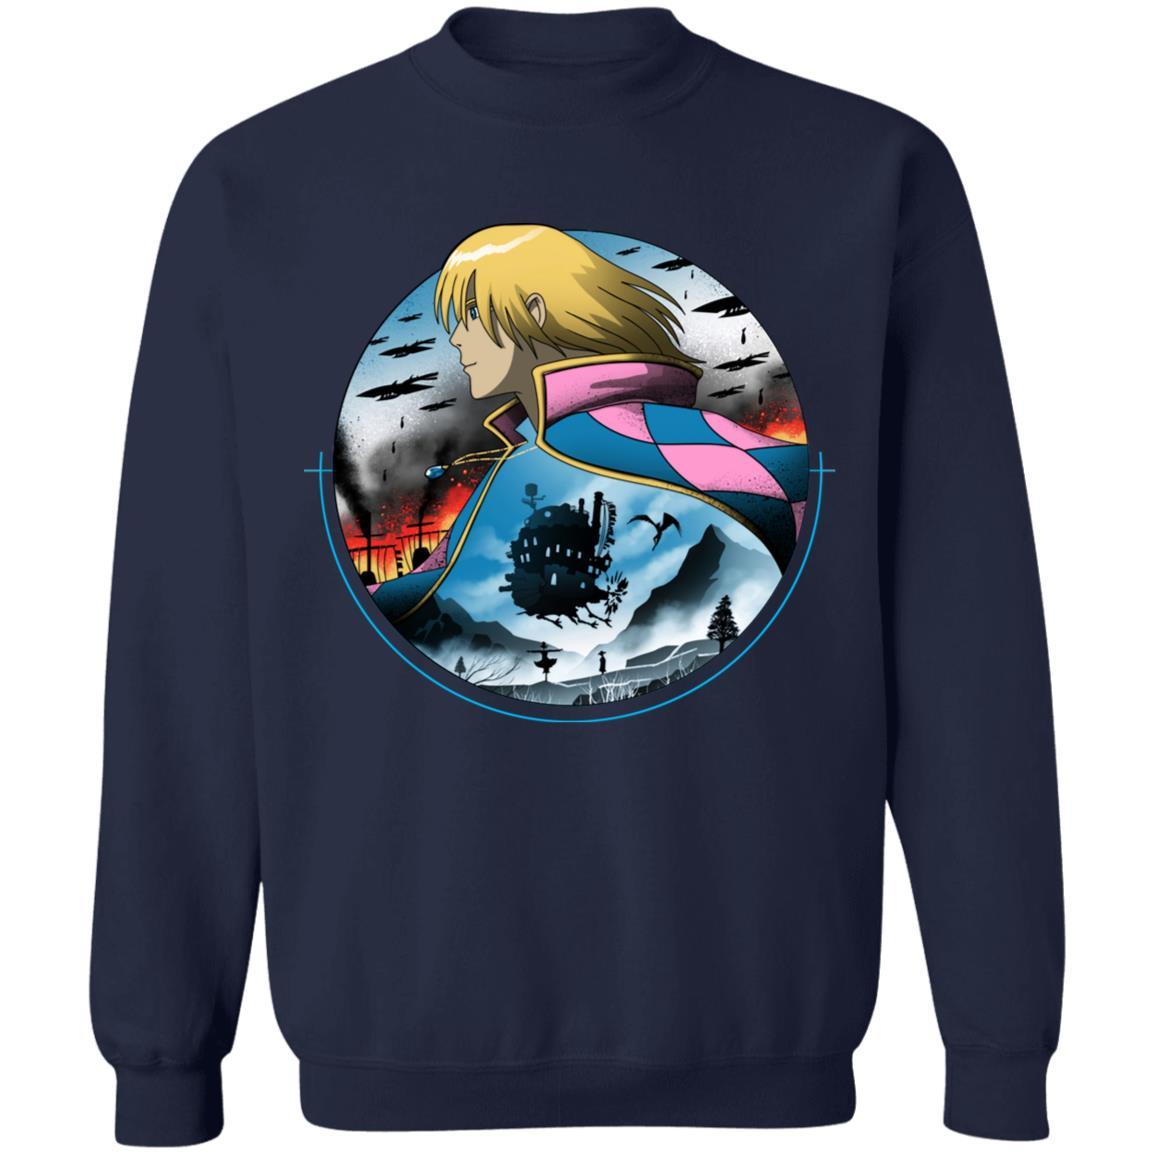 Howl's Moving Castle – The Journey Sweatshirt